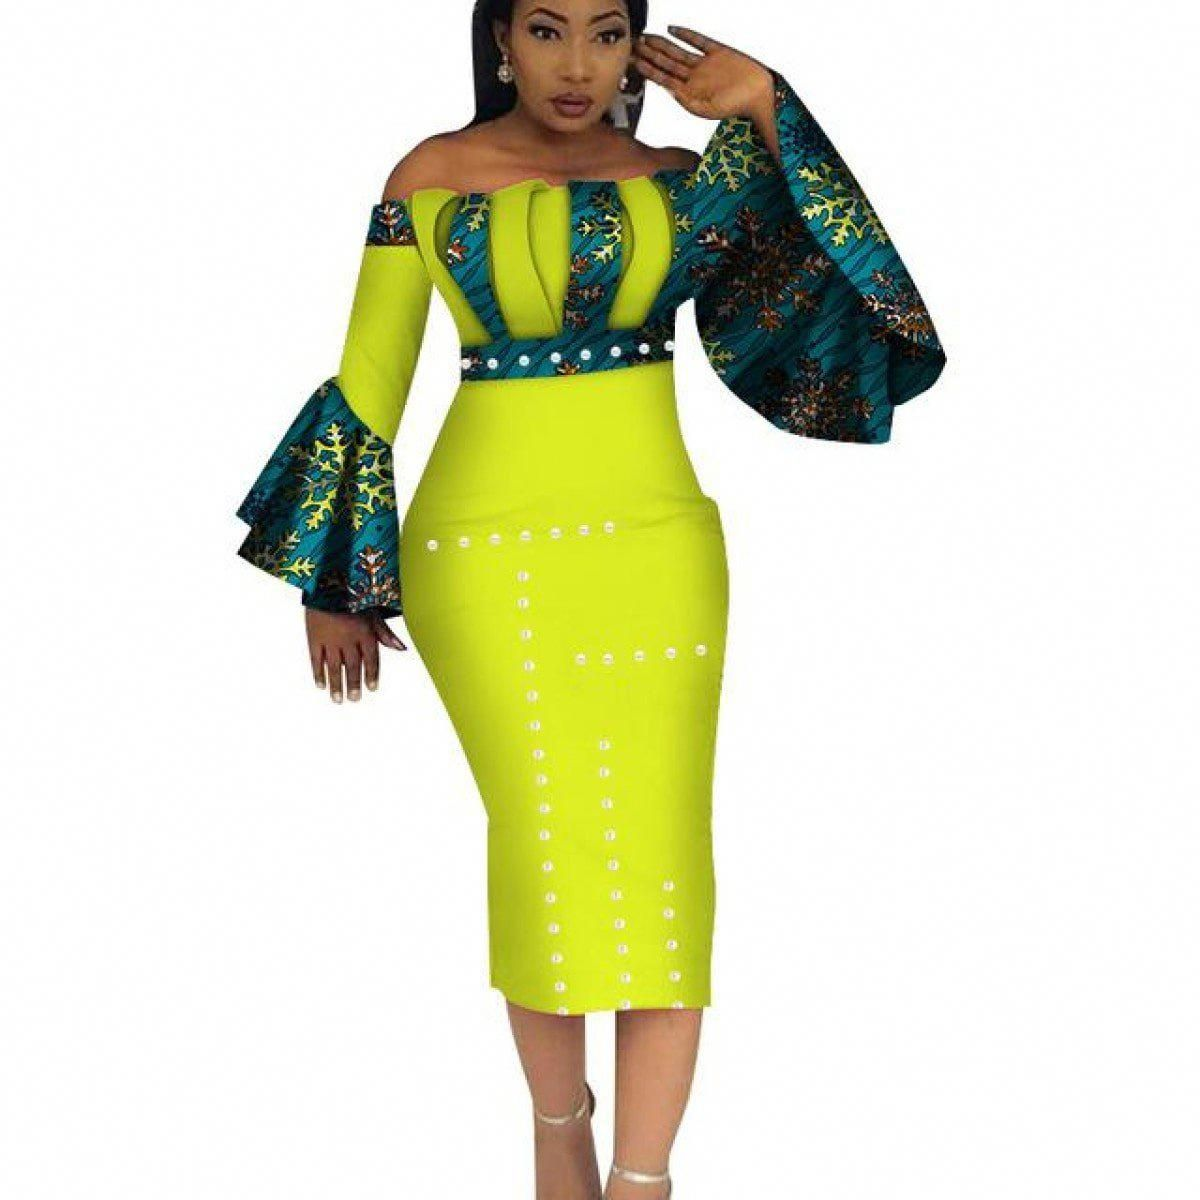 Dashiki Party Hot Vestidos For Women Cotton Print Mid-Calf African X11099